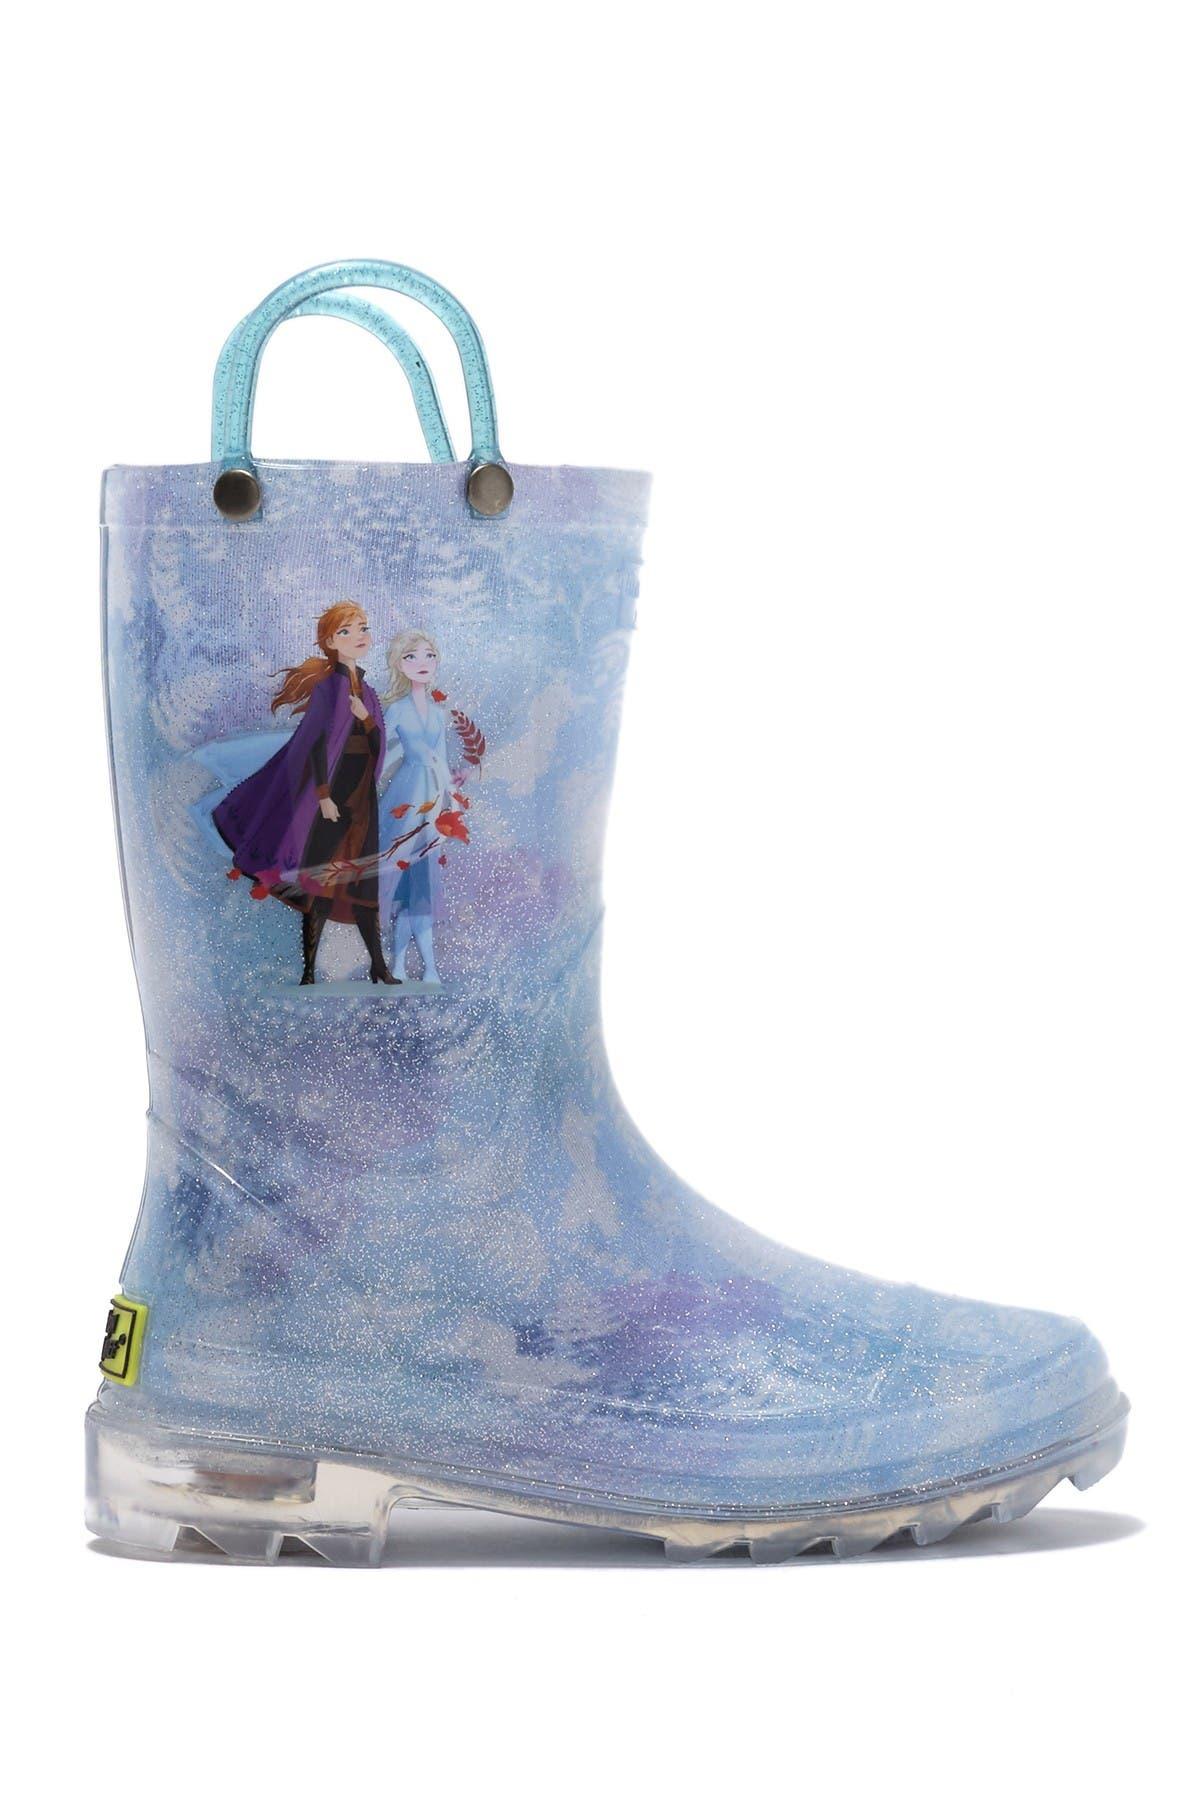 Western Chief Frozen Northern Myth Light Up Rain Boot